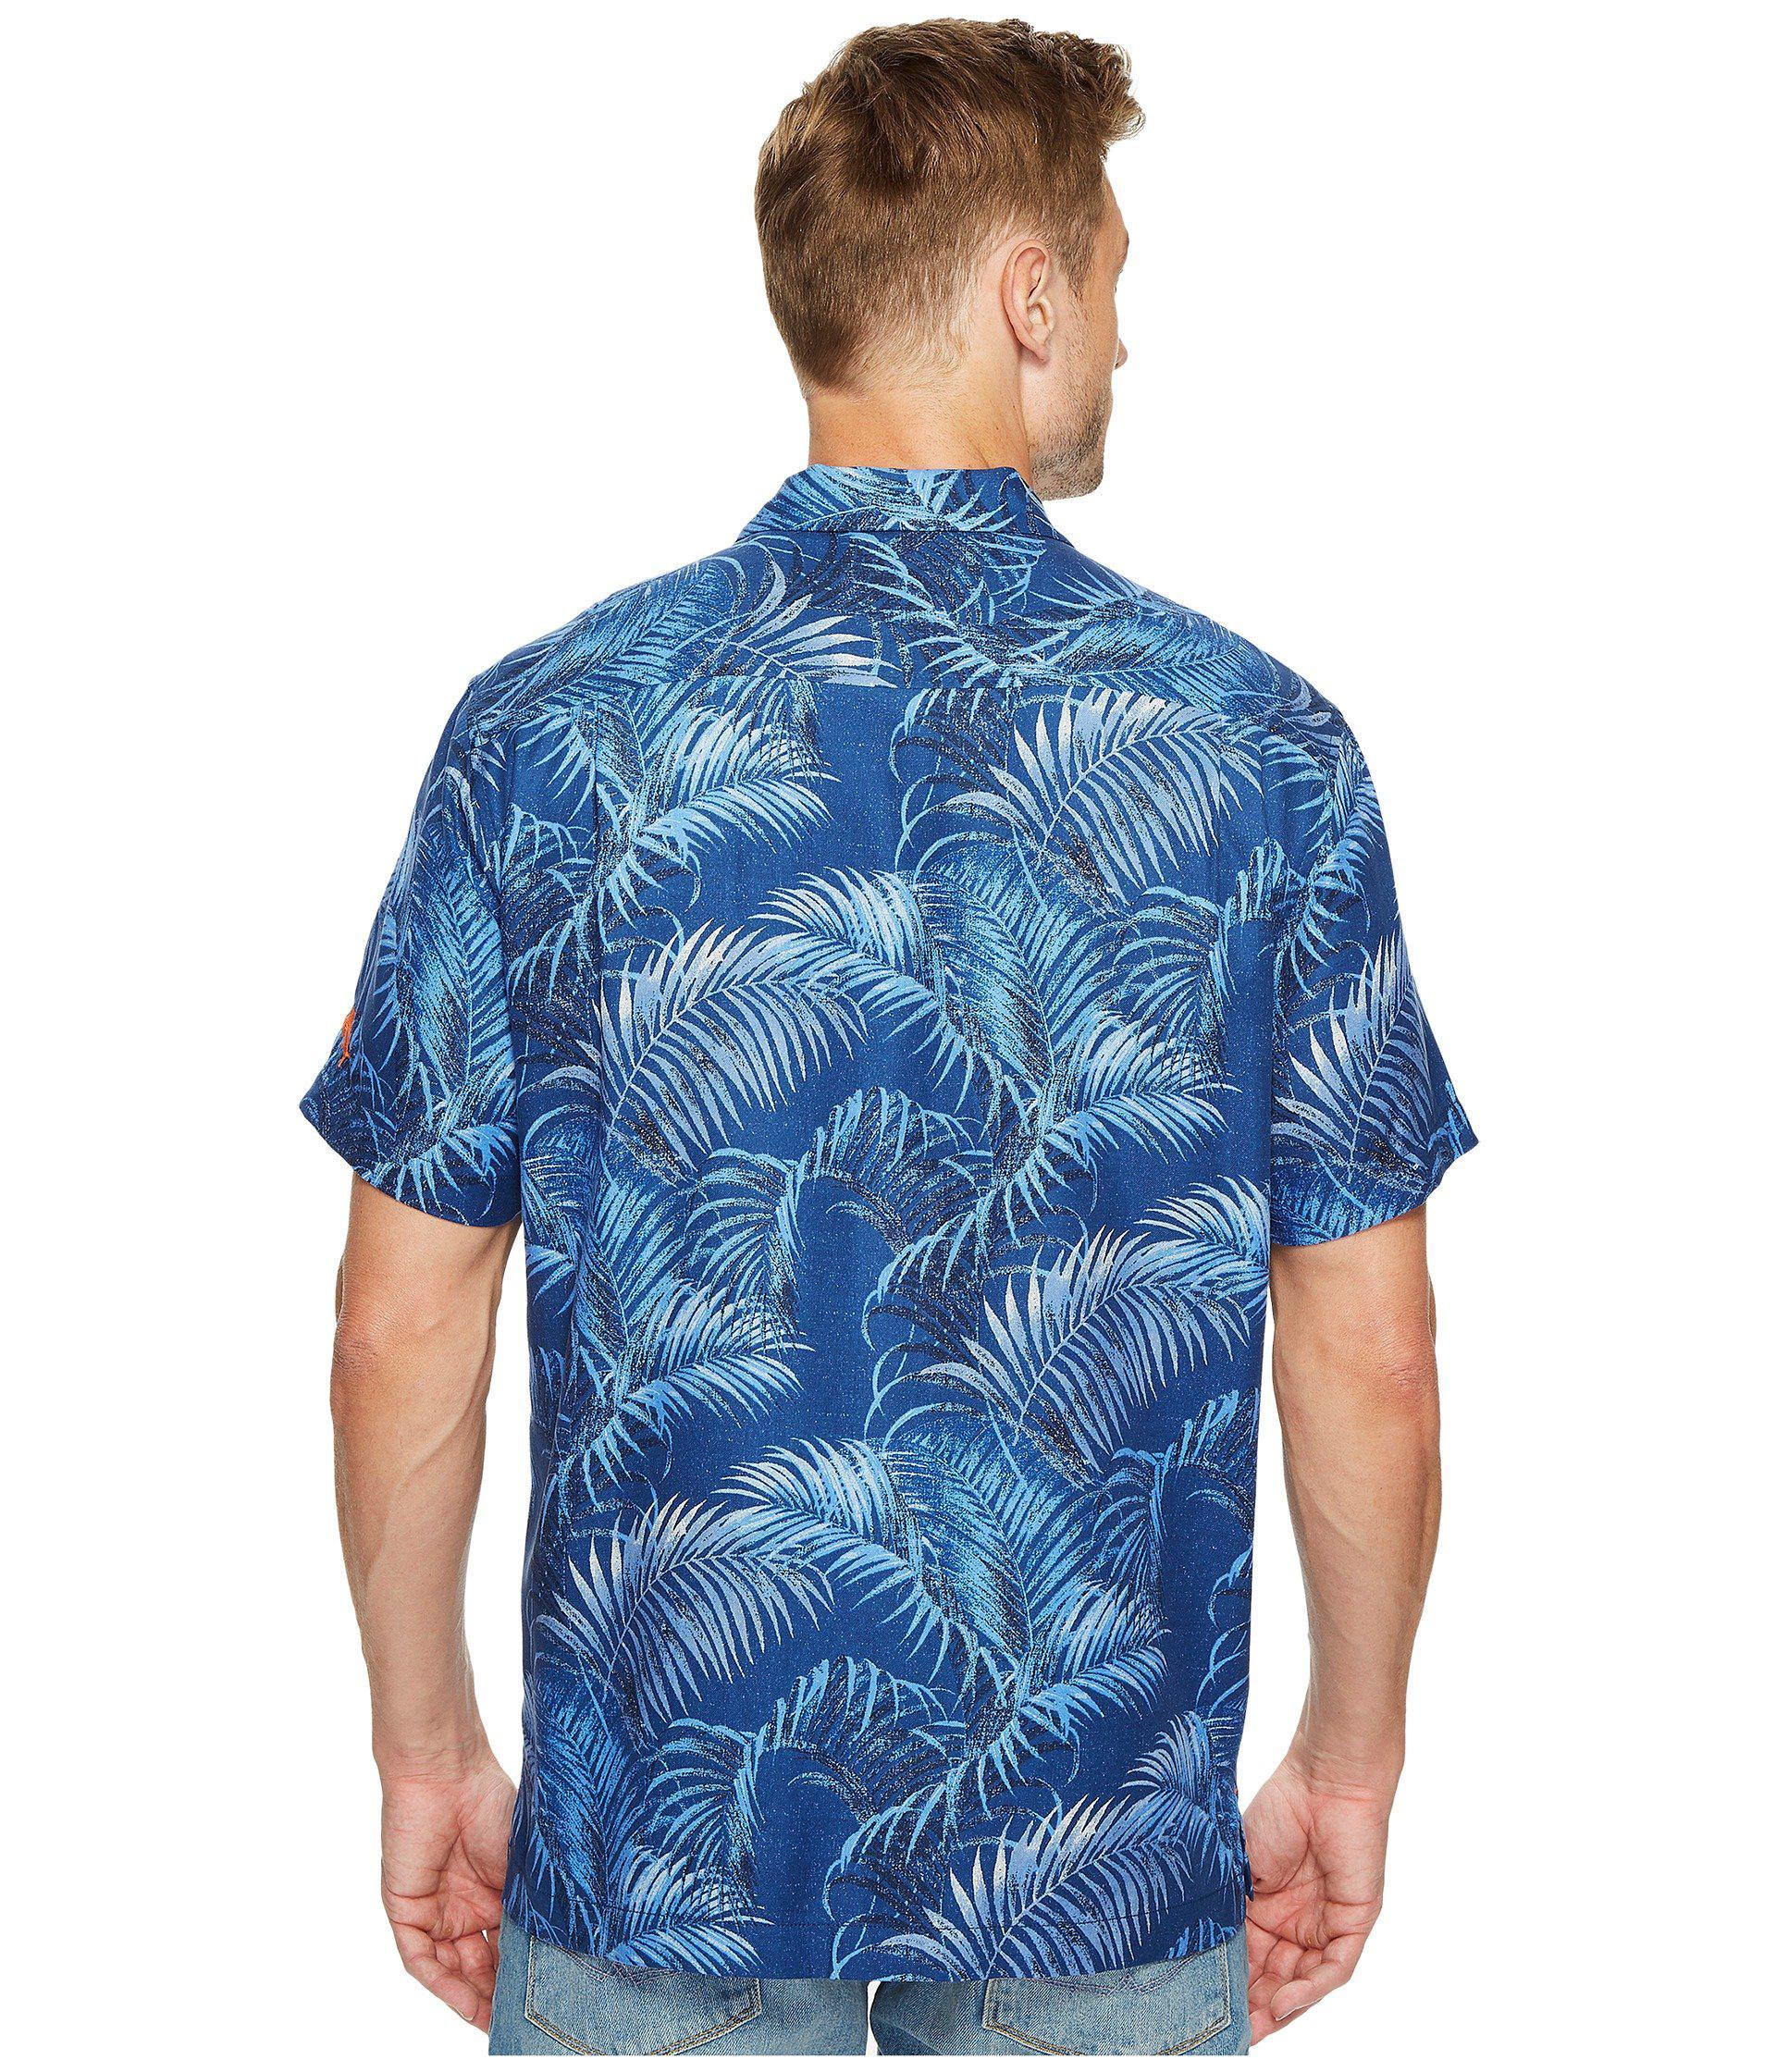 fafc378e6 Tommy Bahama - Blue Denver Broncos Nfl Fez Rounds Shirt for Men - Lyst.  View fullscreen